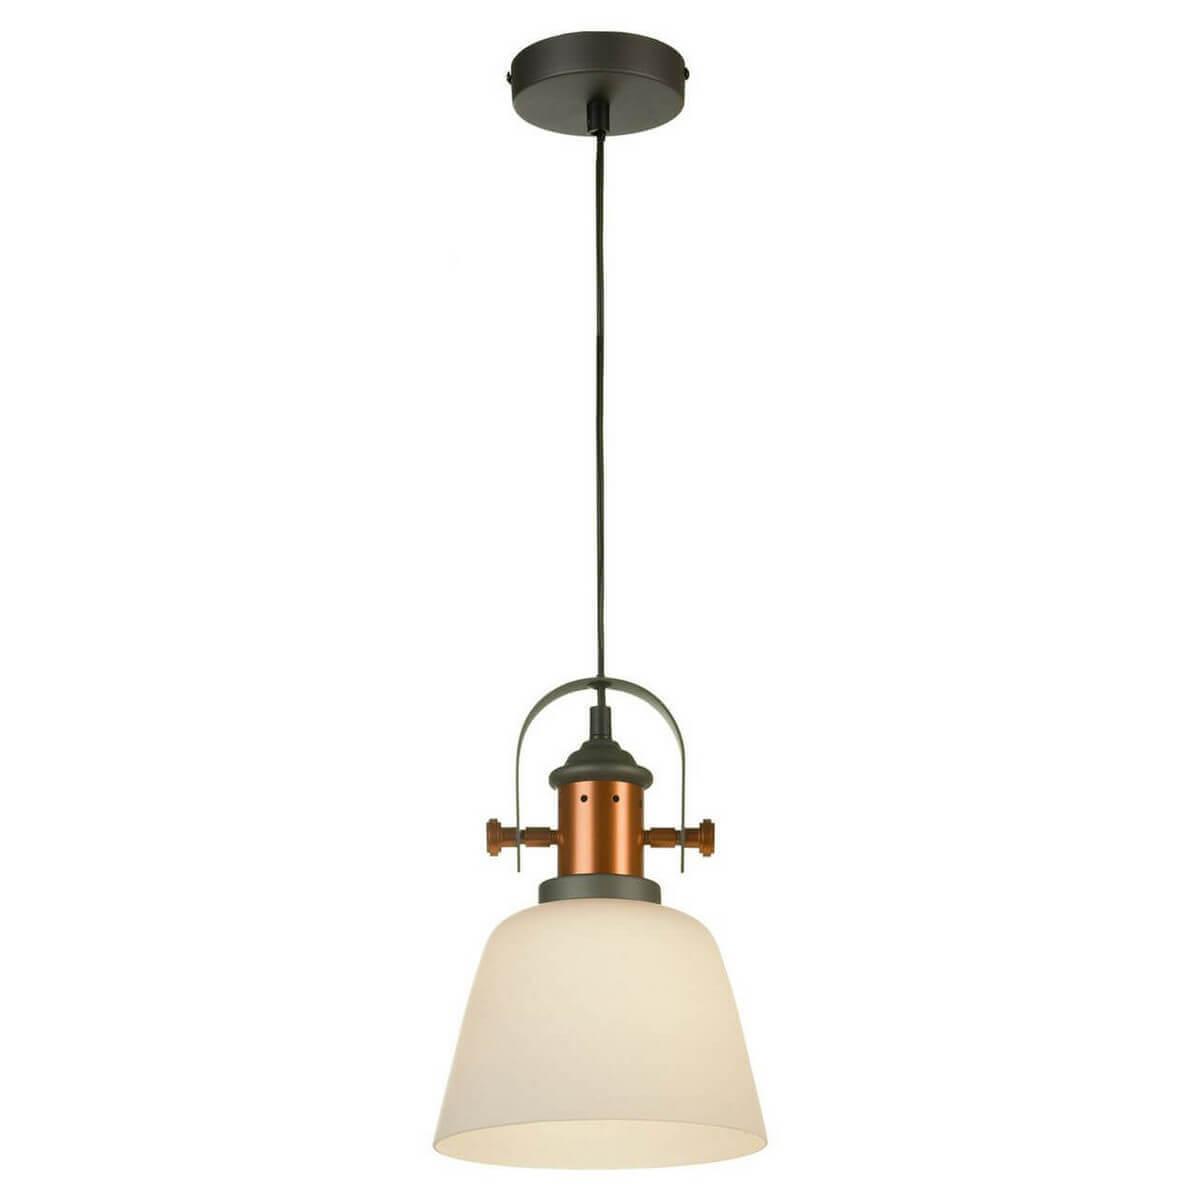 Светильник Lussole LOFT GRLSP-9846 LSP-9845 подвесной светильник lussole loft grlsp 9846